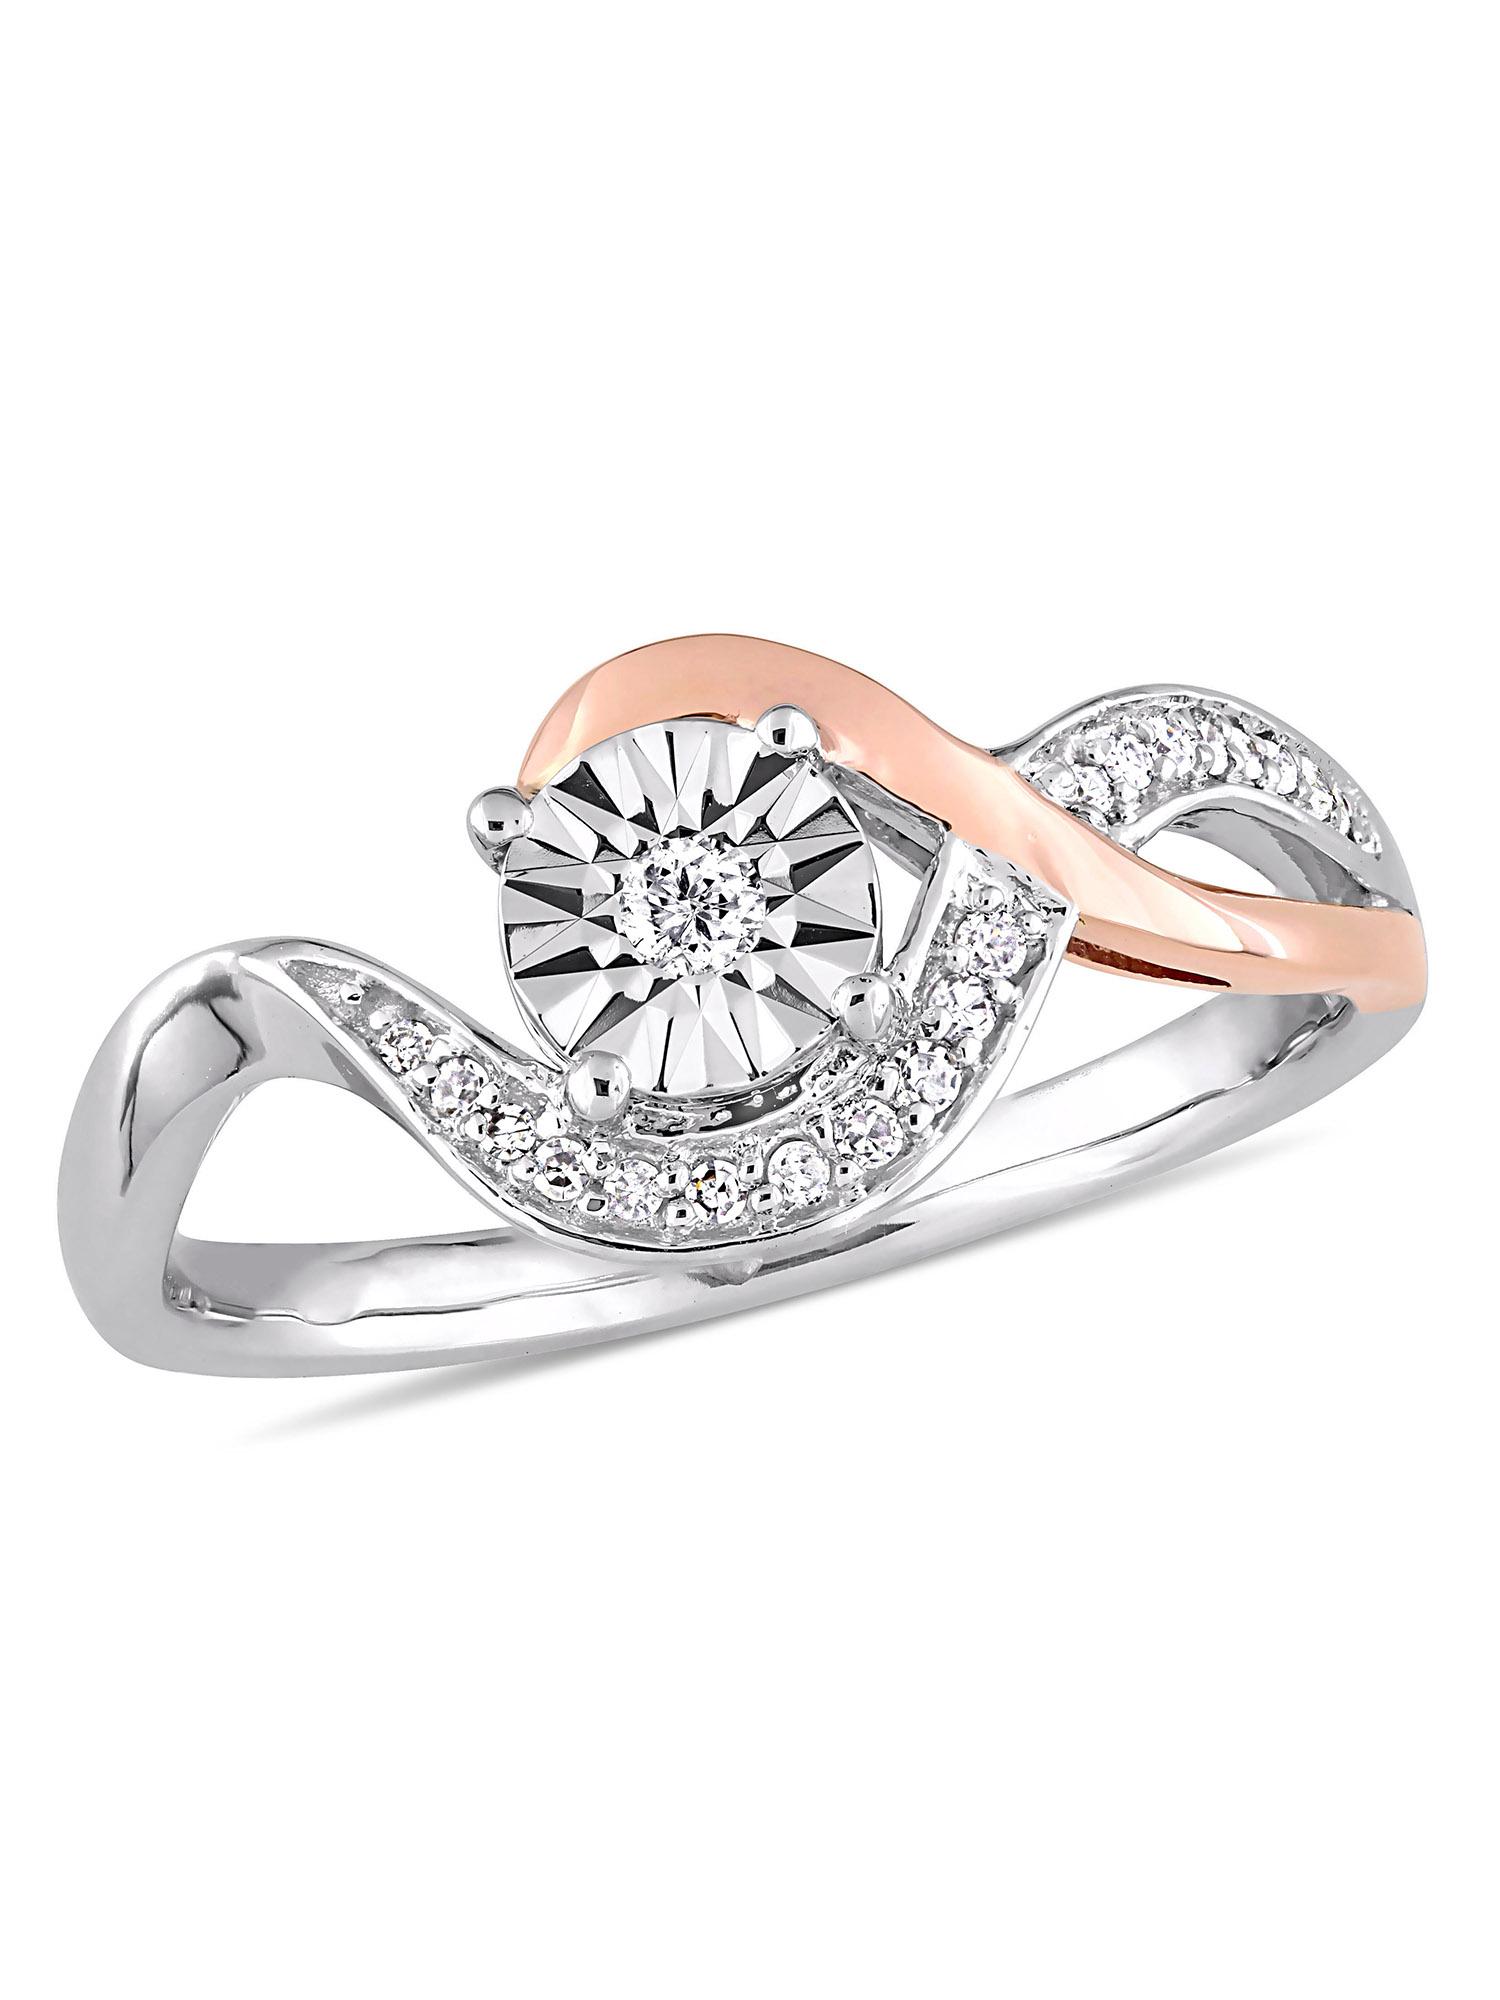 1/10 Carat Diamond 10kt Two-Tone Gold Swirl Promise Ring